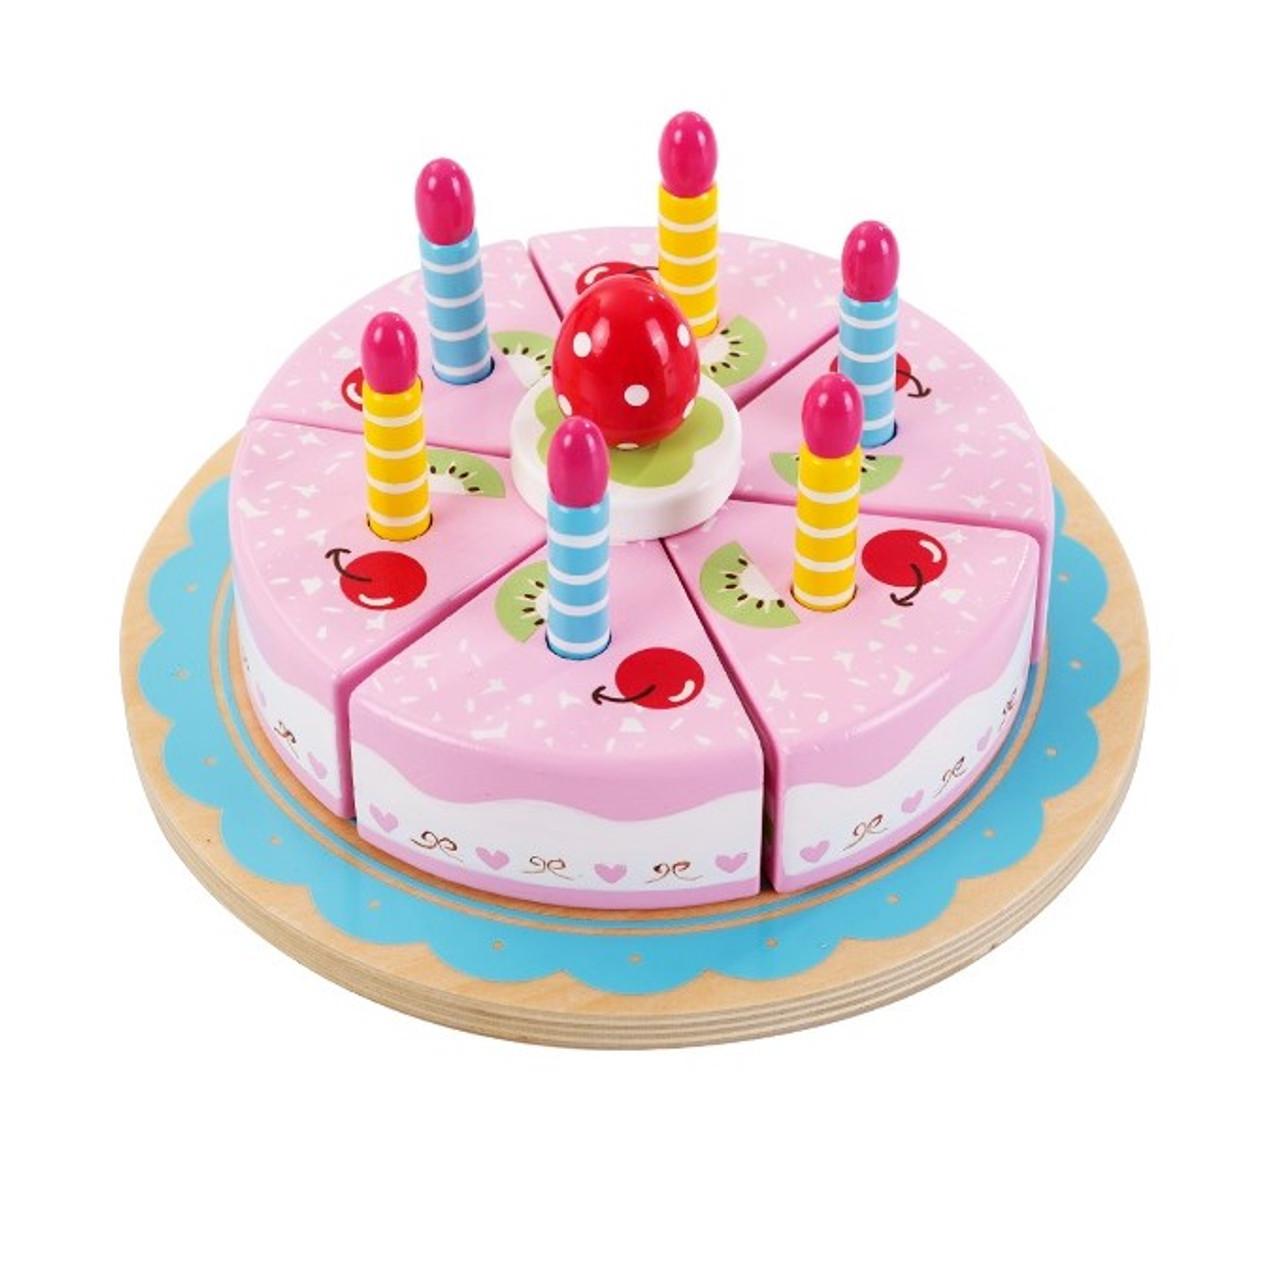 Astonishing Wooden Birthday Cake Sawt18210 3 Toymate Your Local Toy Store Funny Birthday Cards Online Drosicarndamsfinfo